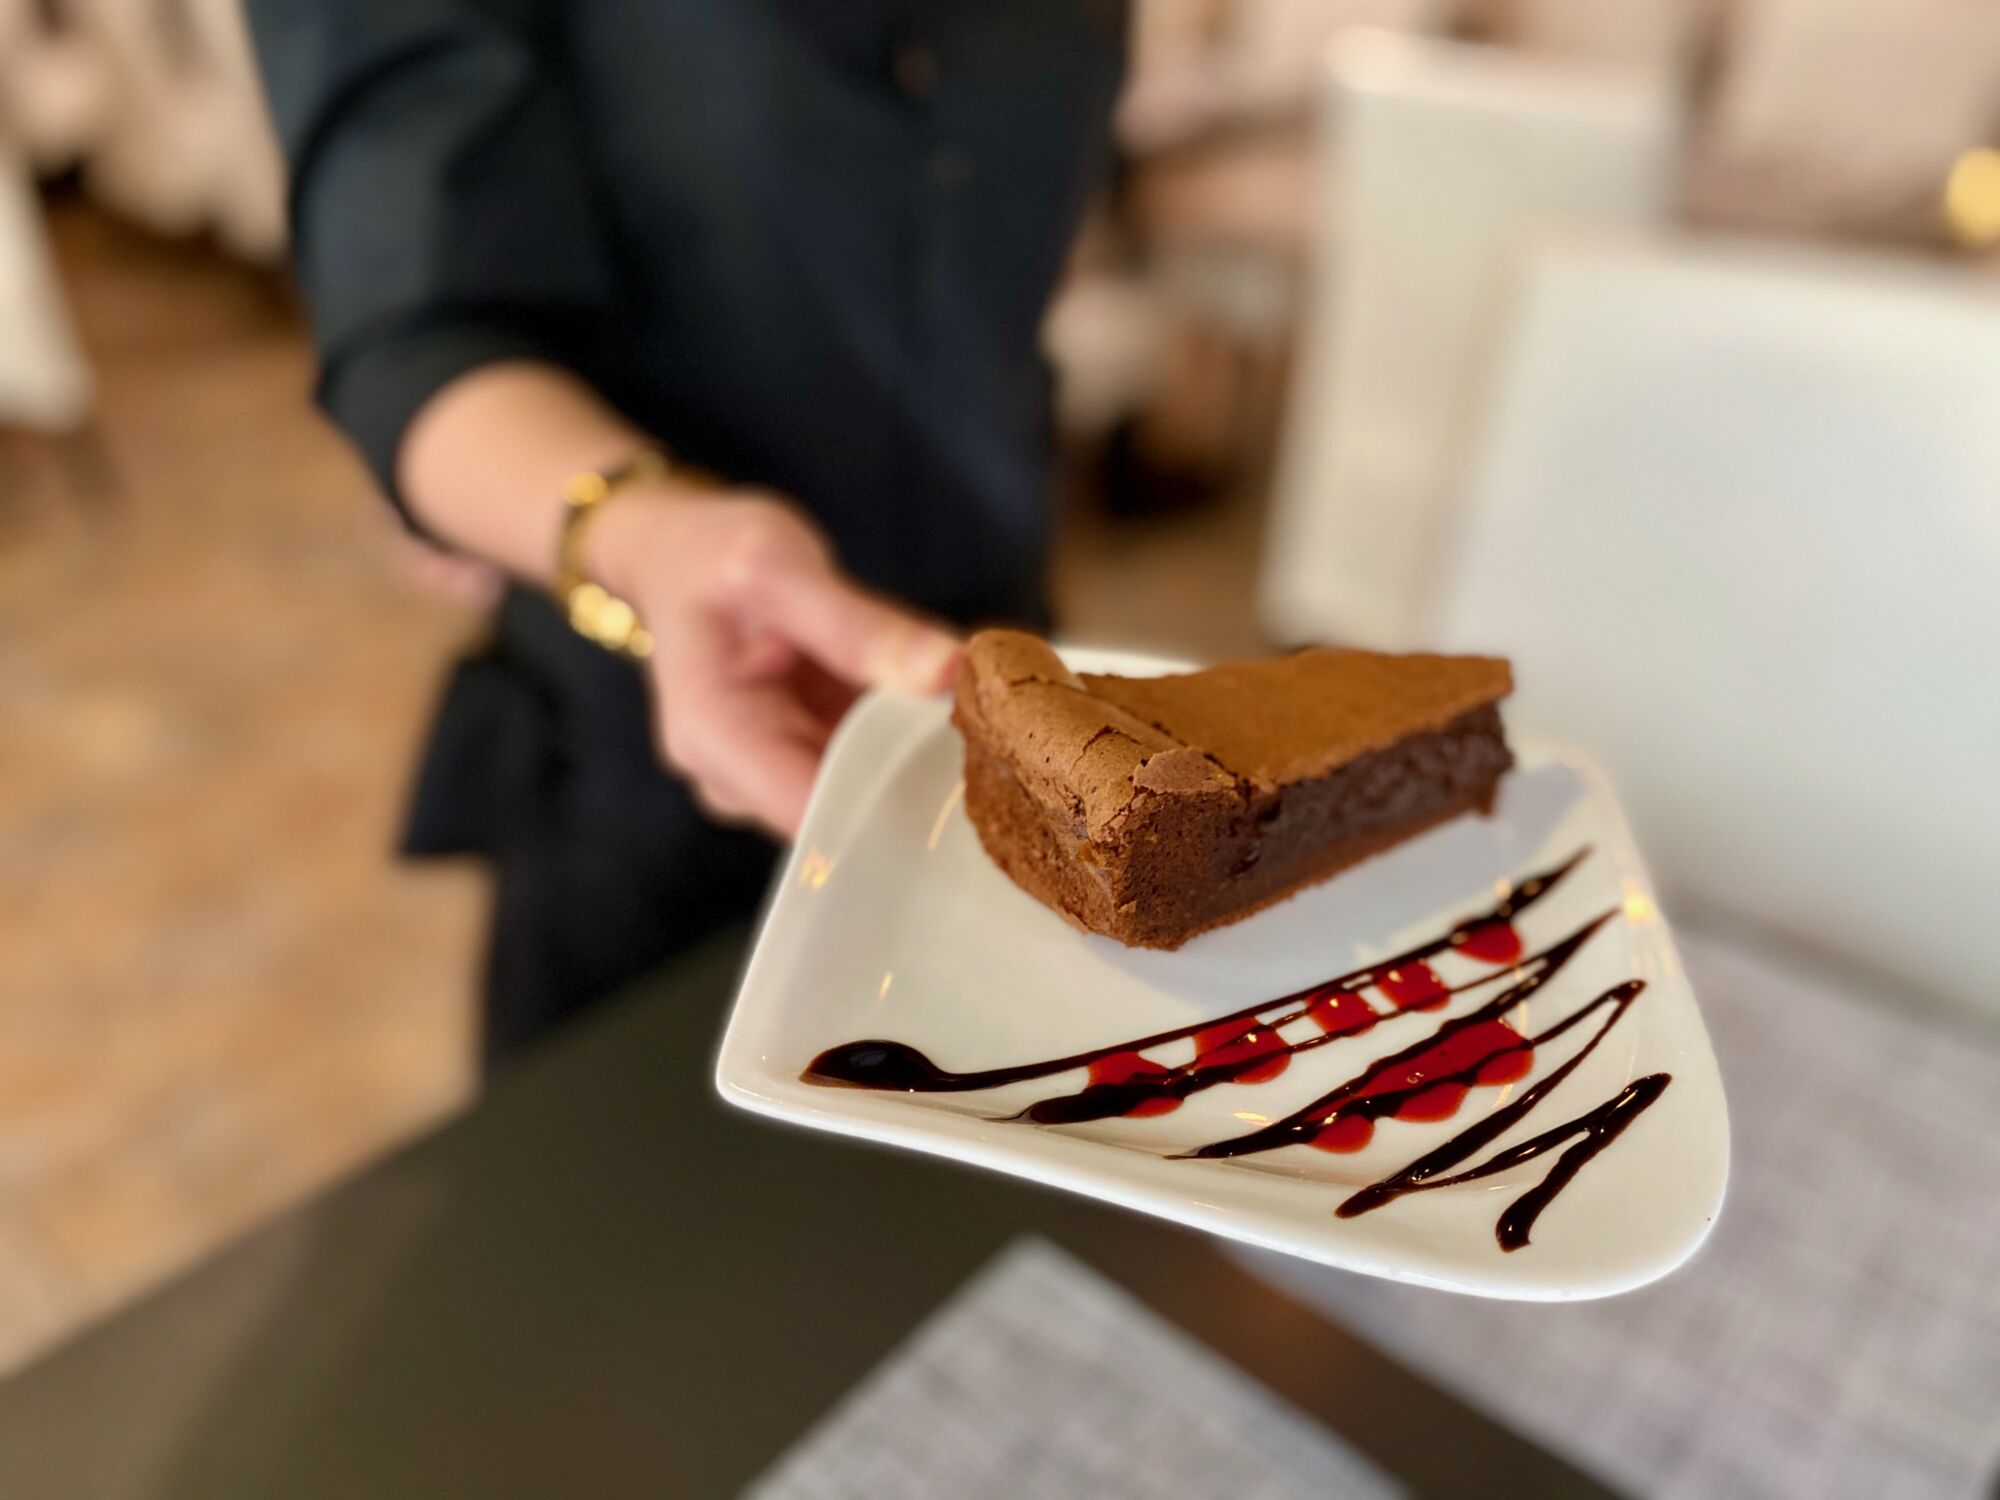 mariazinha portuguese restaurant macau chocolate sponge cake